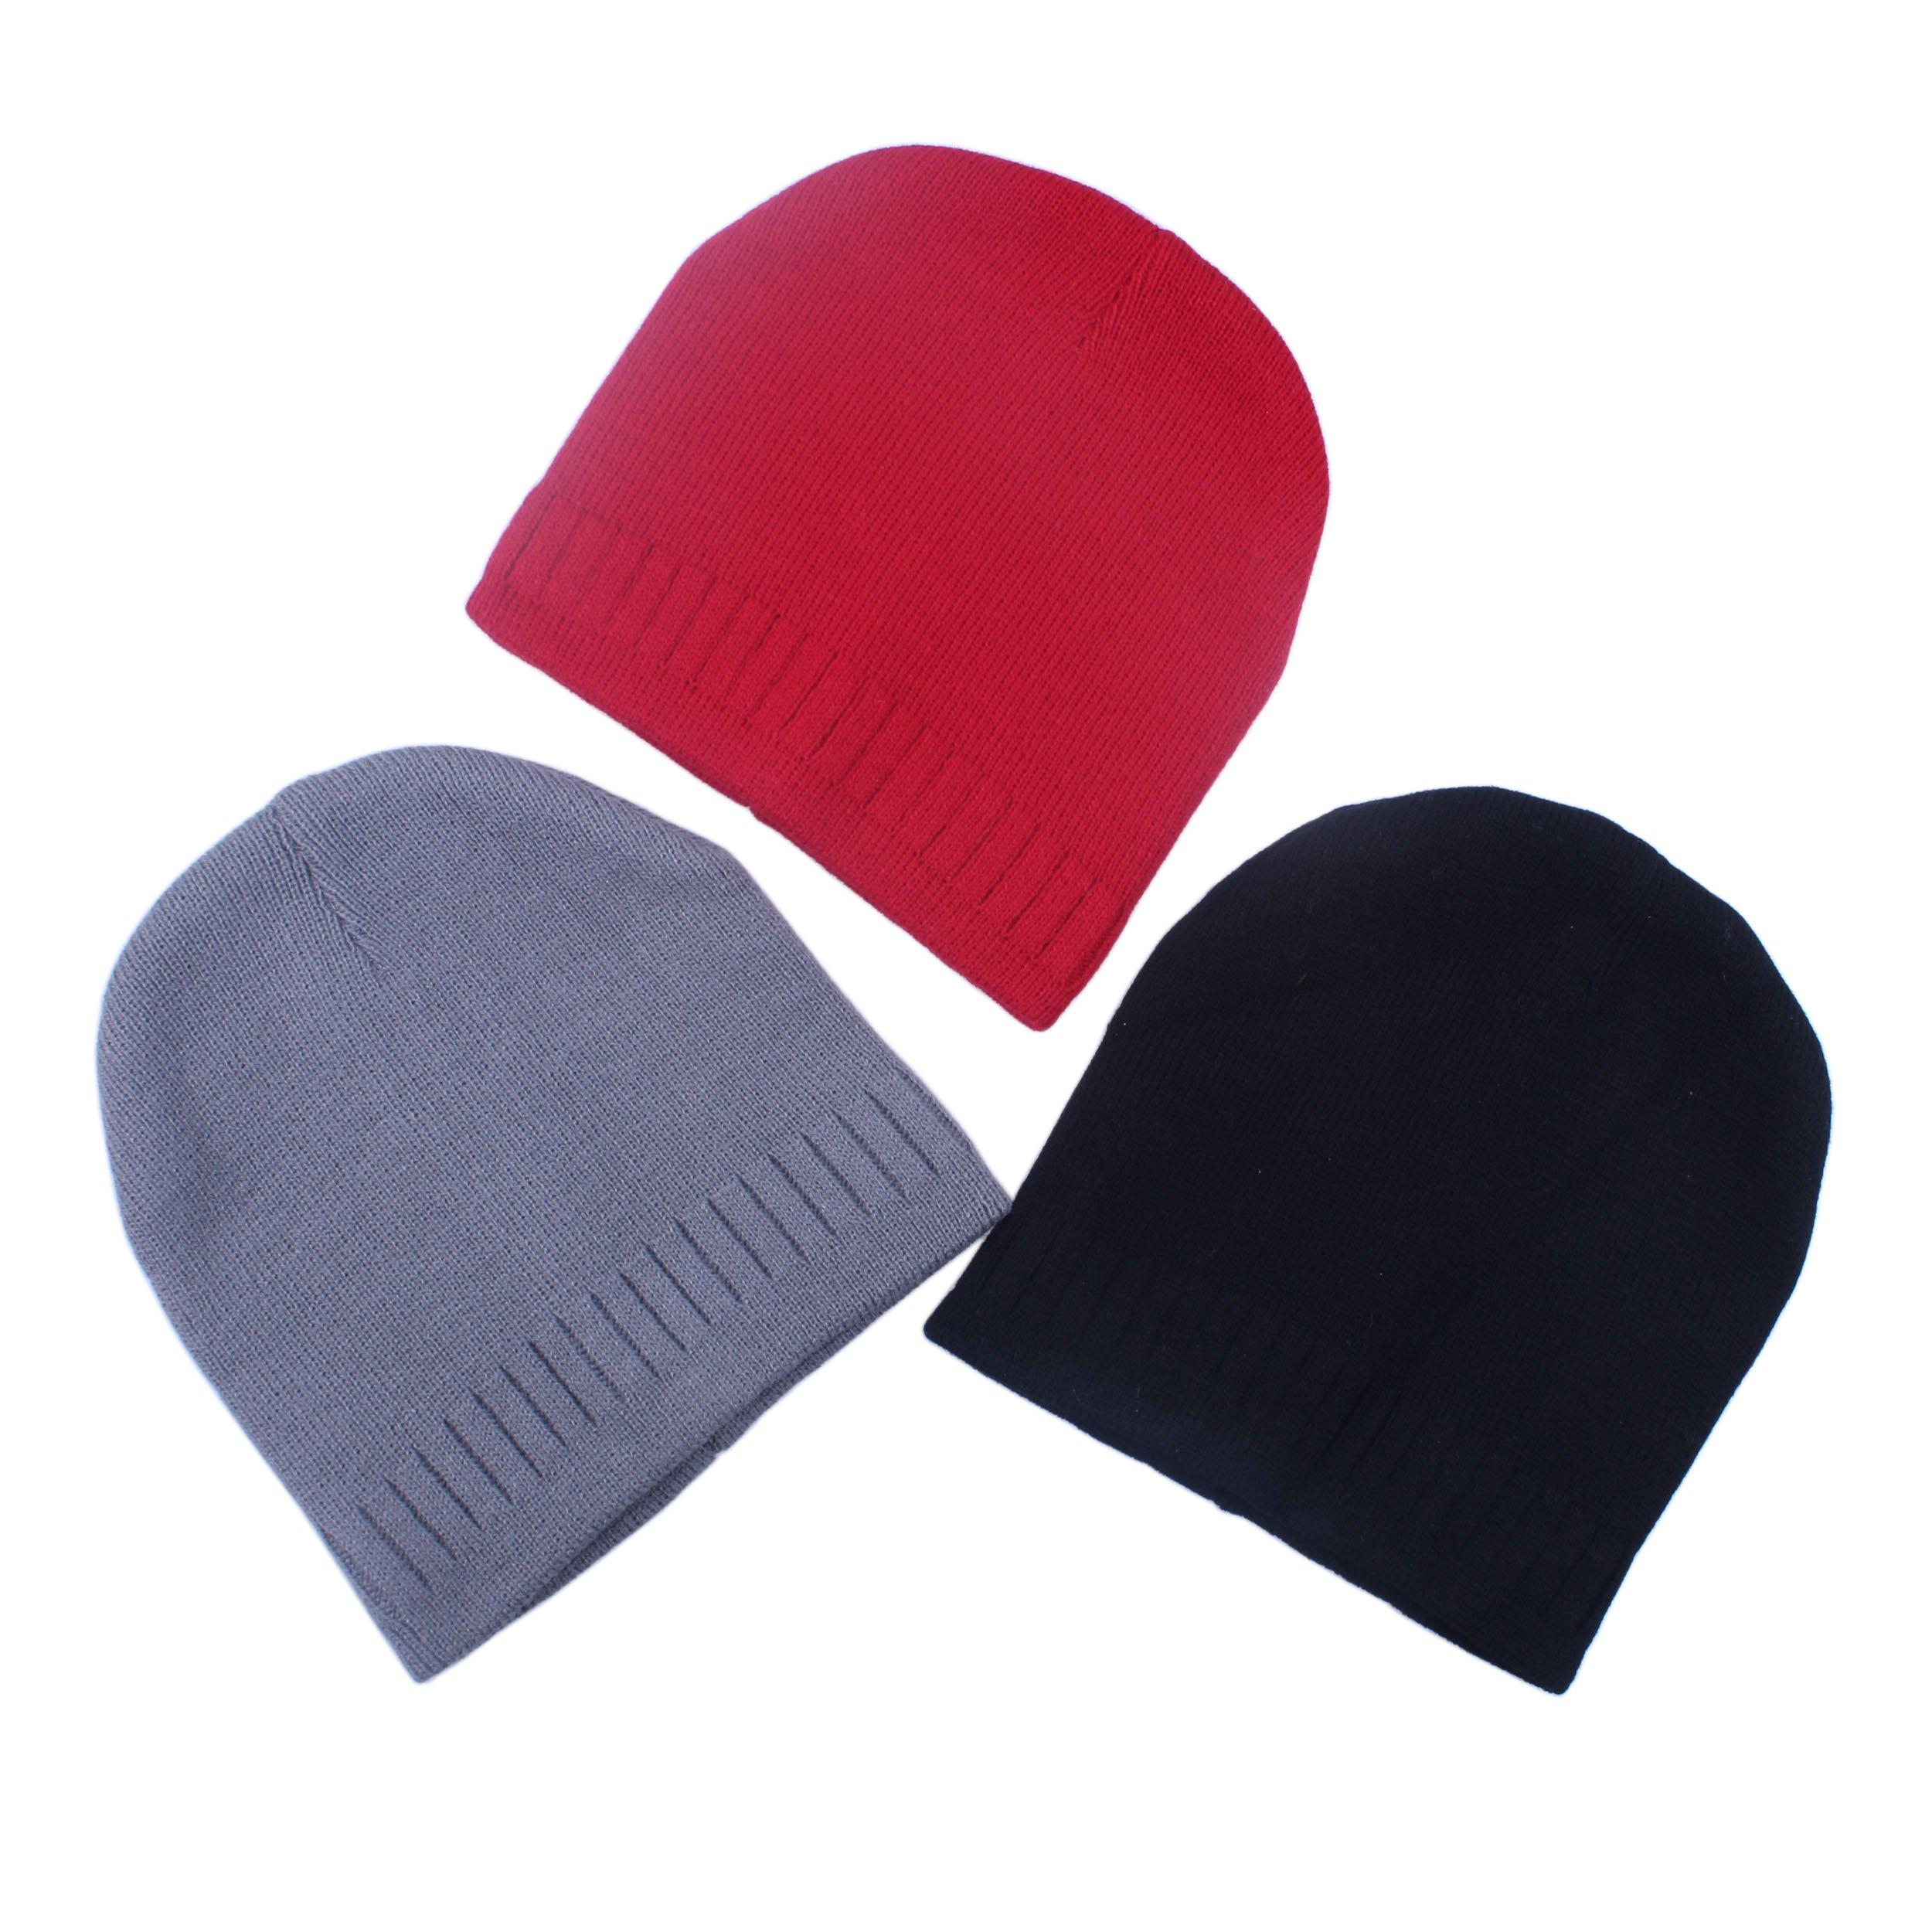 3pcs Toddler Kids Boy Winter Warm Beanies Crochet Knit Hat Cap (Grey Black Red, 4 To 10 Years) by kimmyku (Image #2)